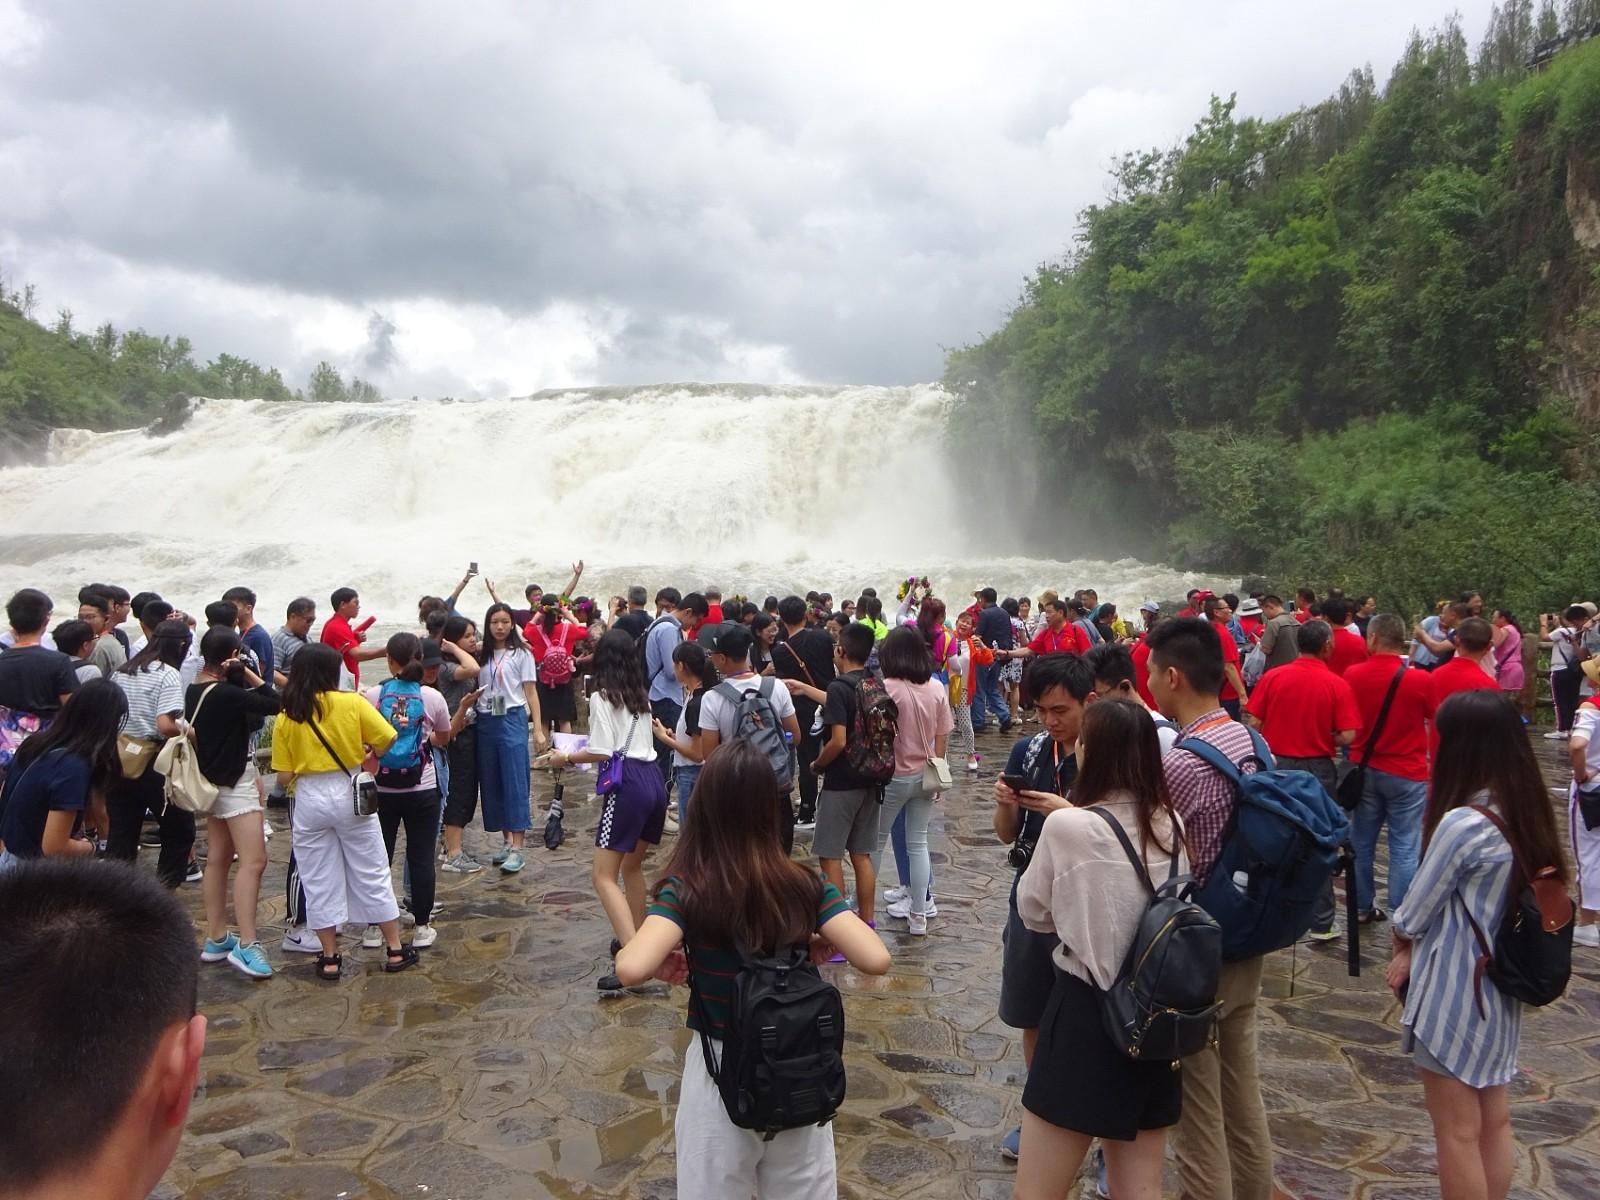 Huangguoshu Waterfall enters wet season, sees surge in visitors